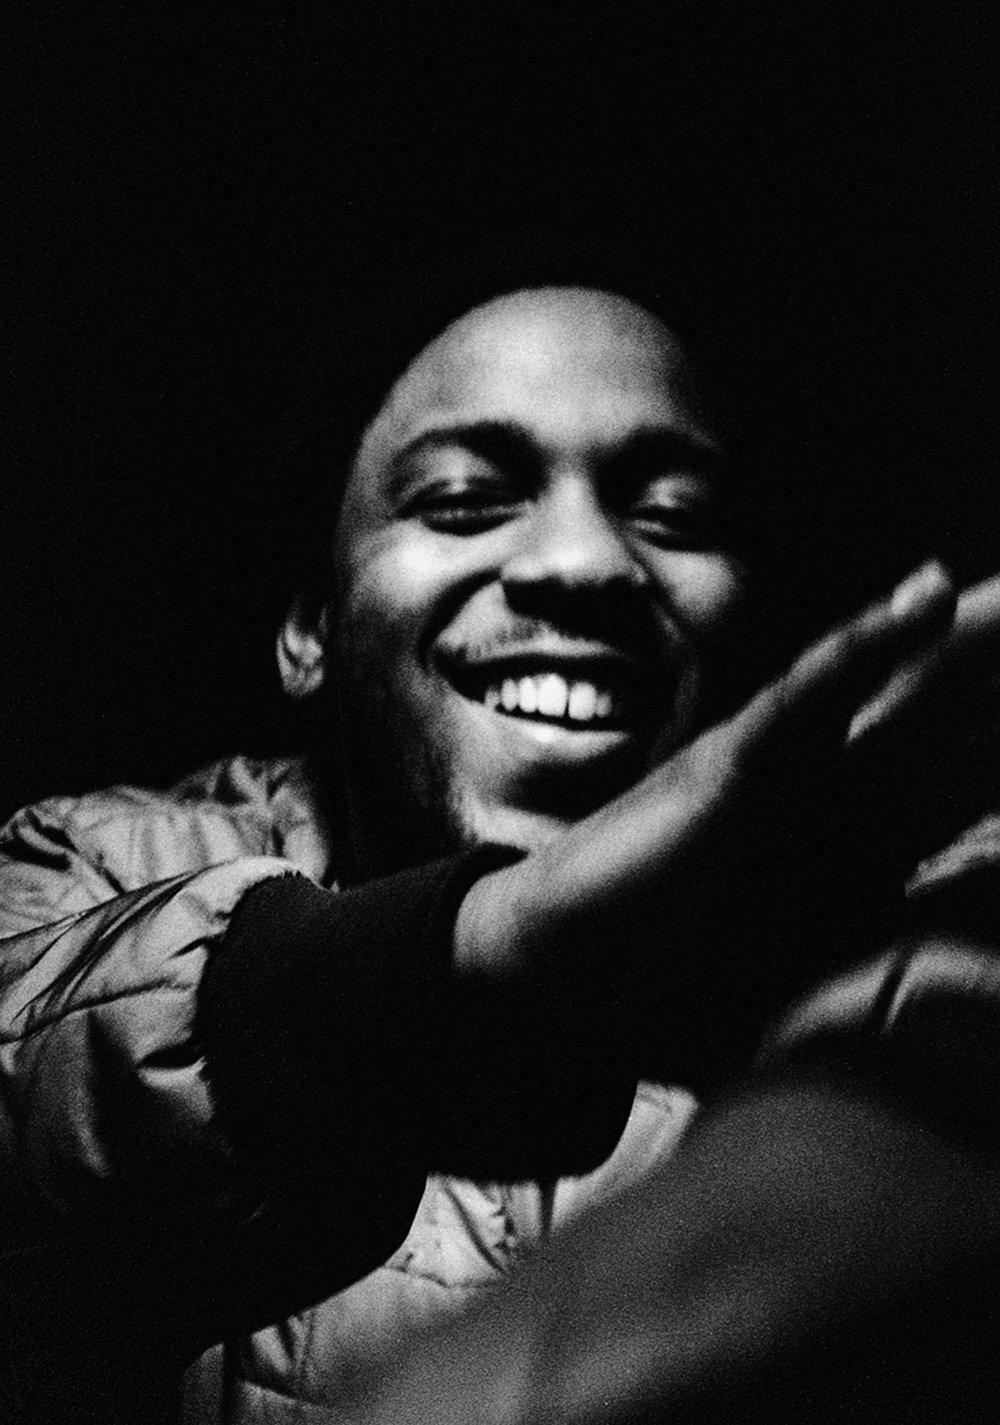 01-Kendrick-Lamar-photographed-by-Nabil-Elderkin-billboard-1240.jpg